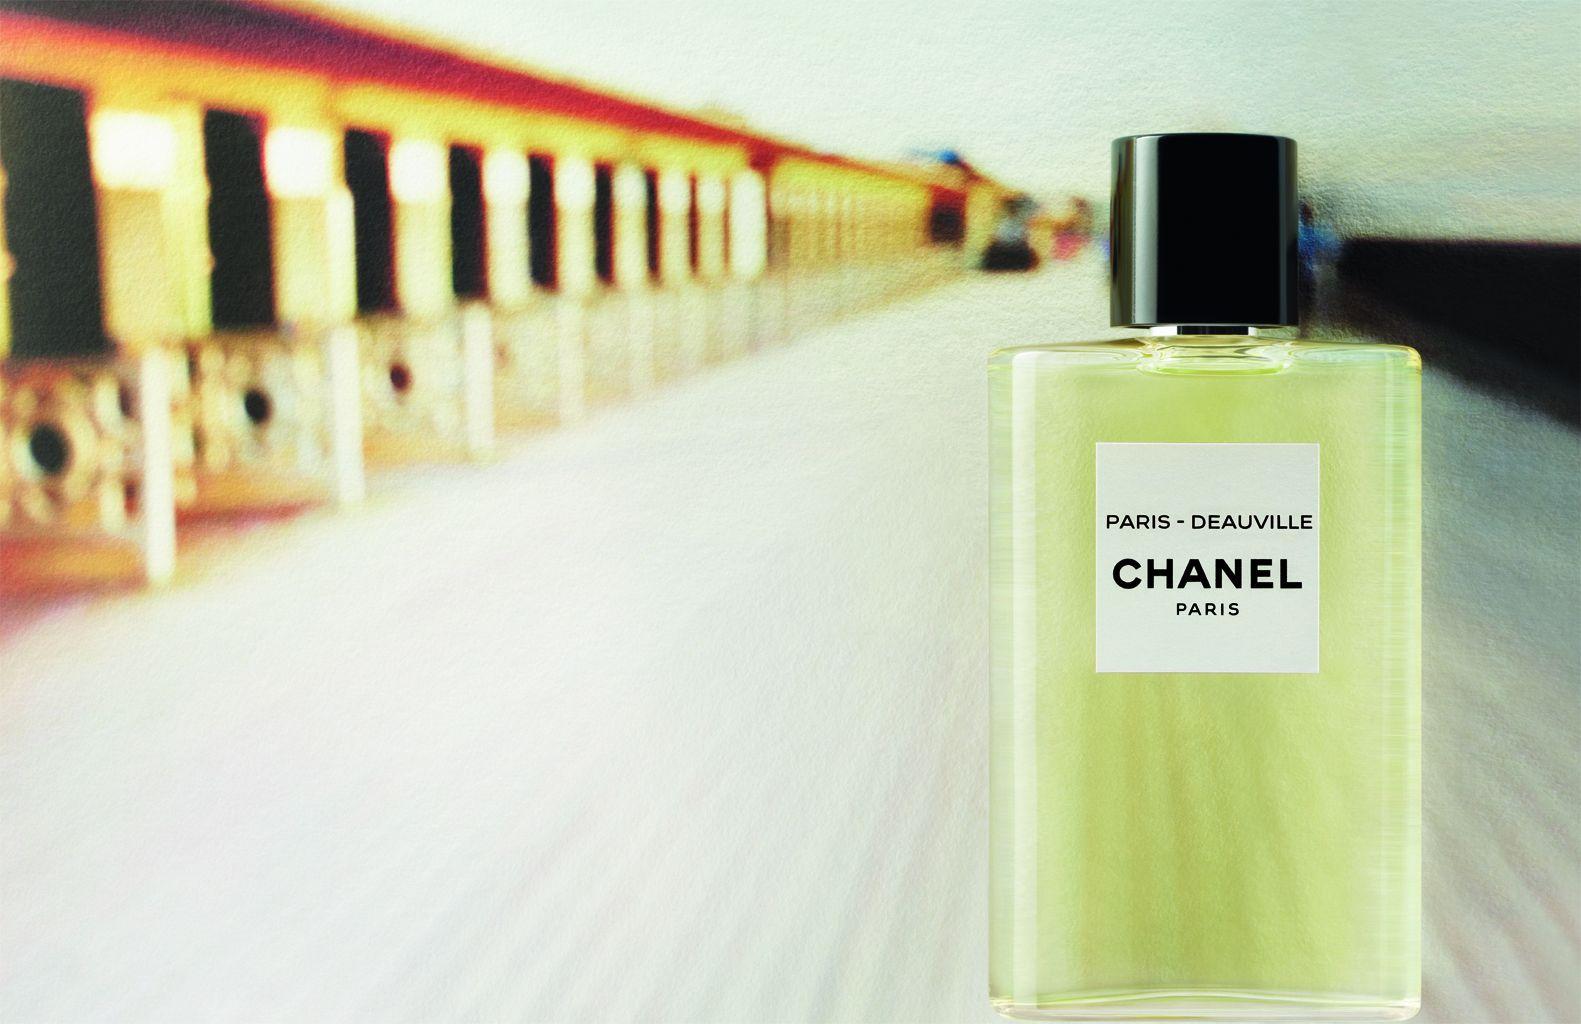 nước hoa chanel paris deauvillie